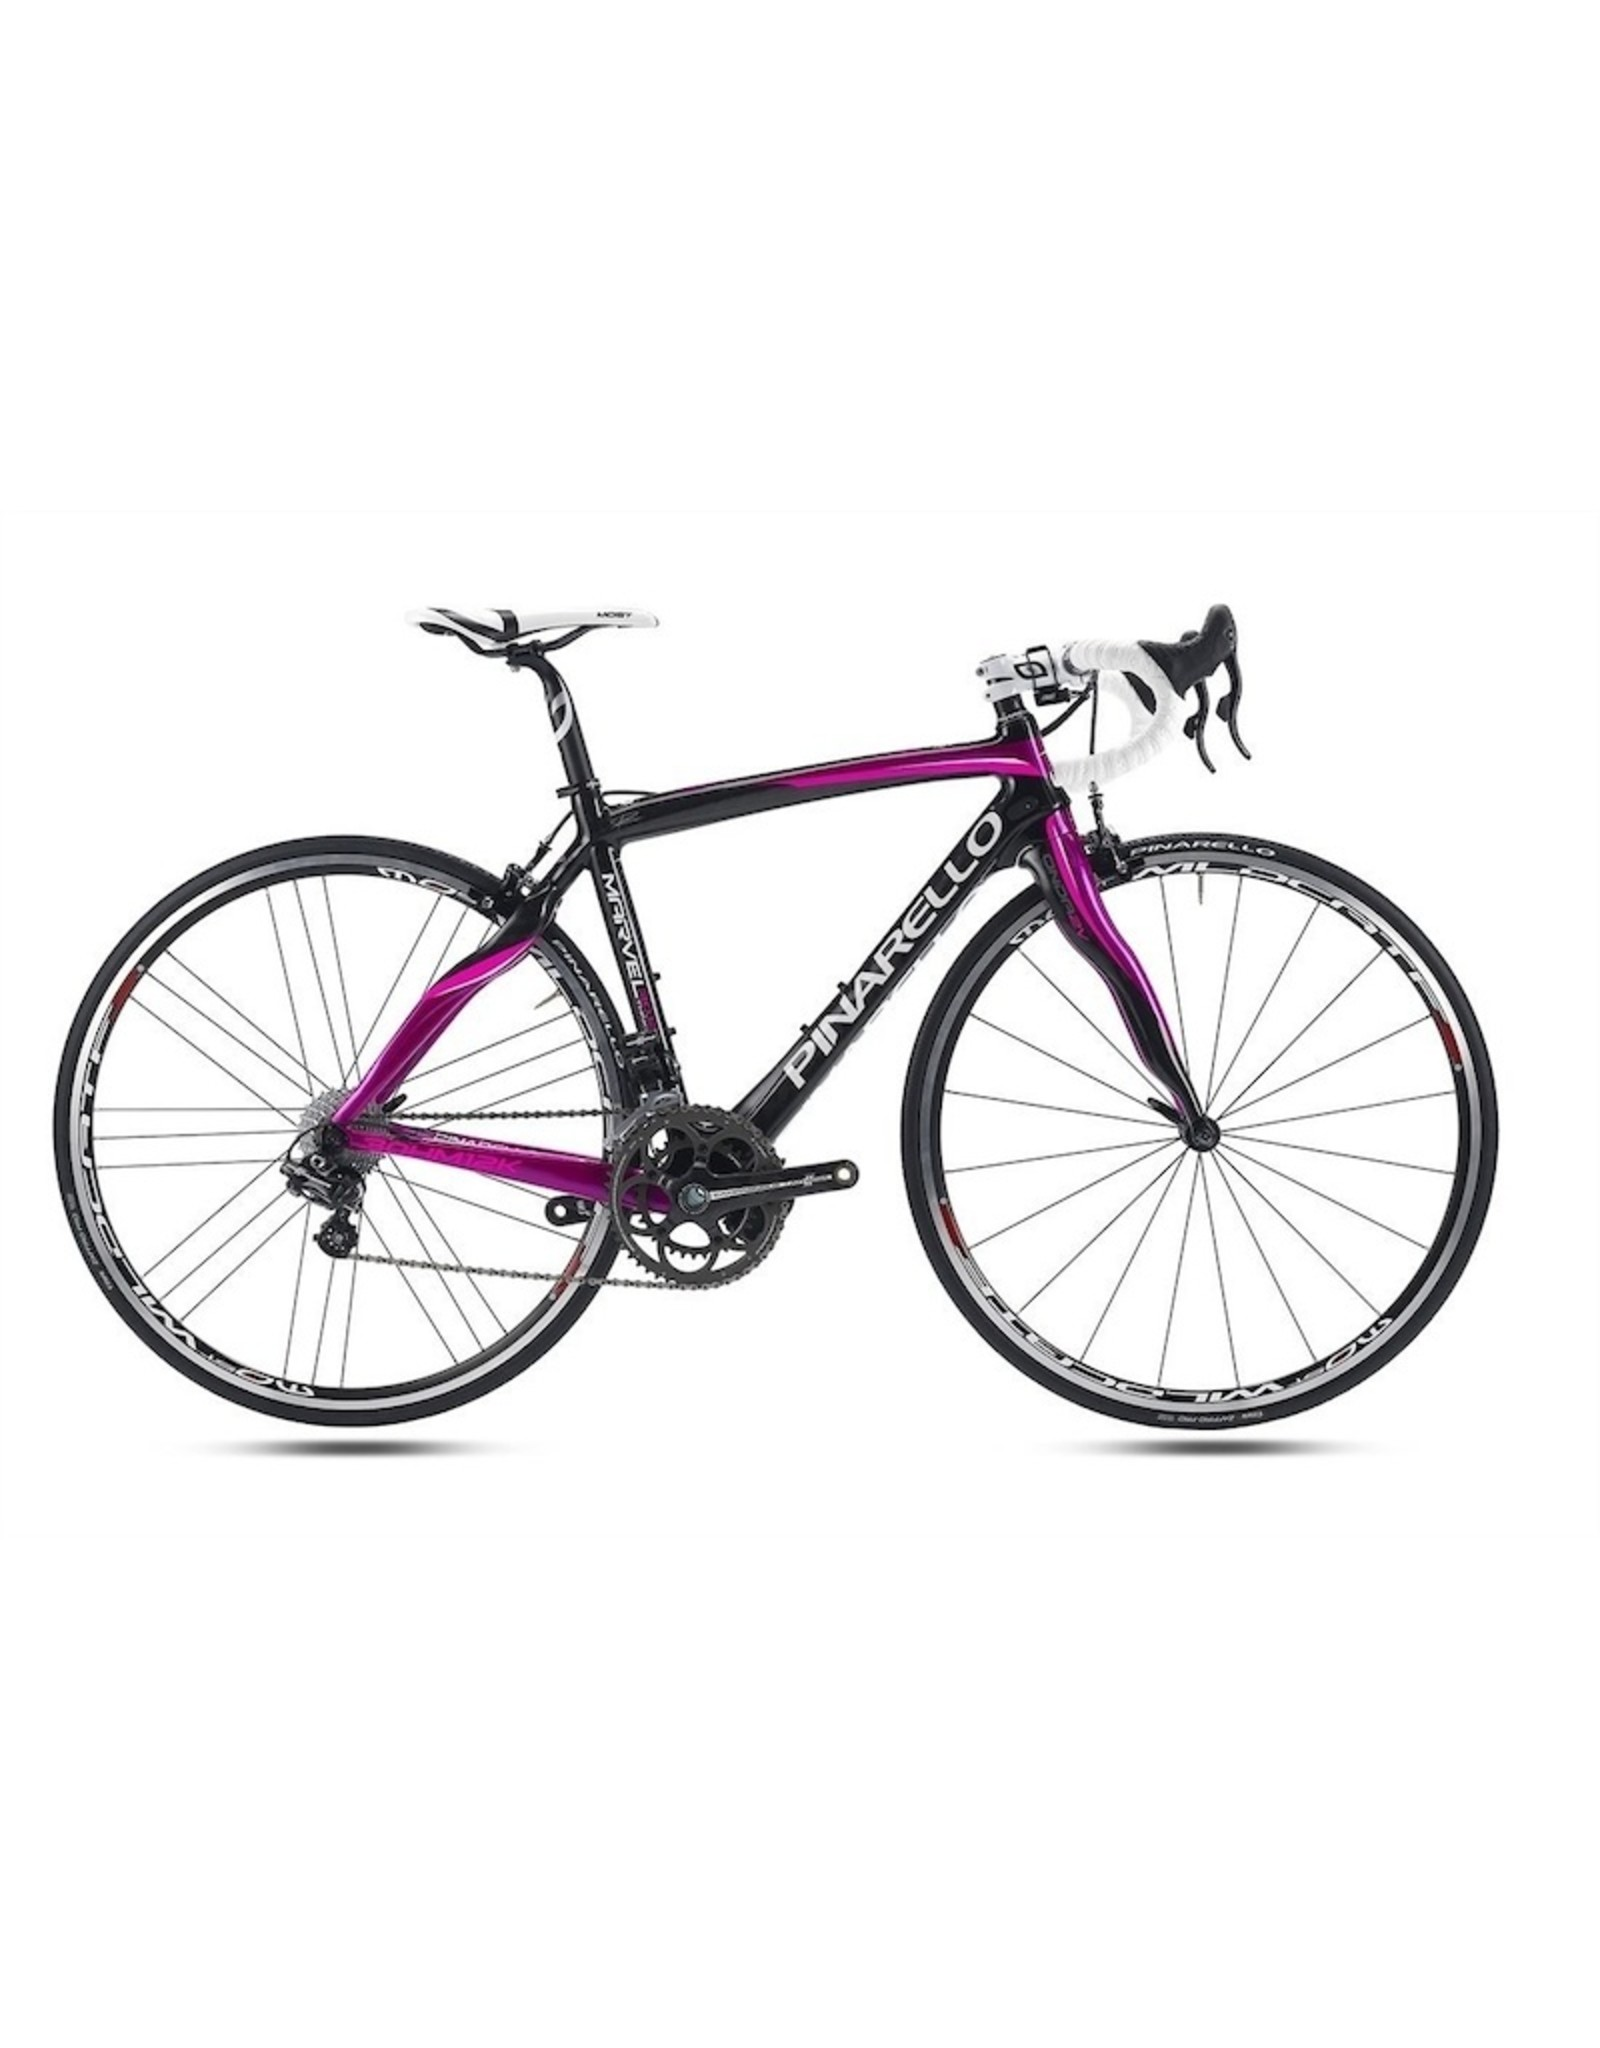 16 Pinarello Marvel T2 49cm Ultegra Black/Pink